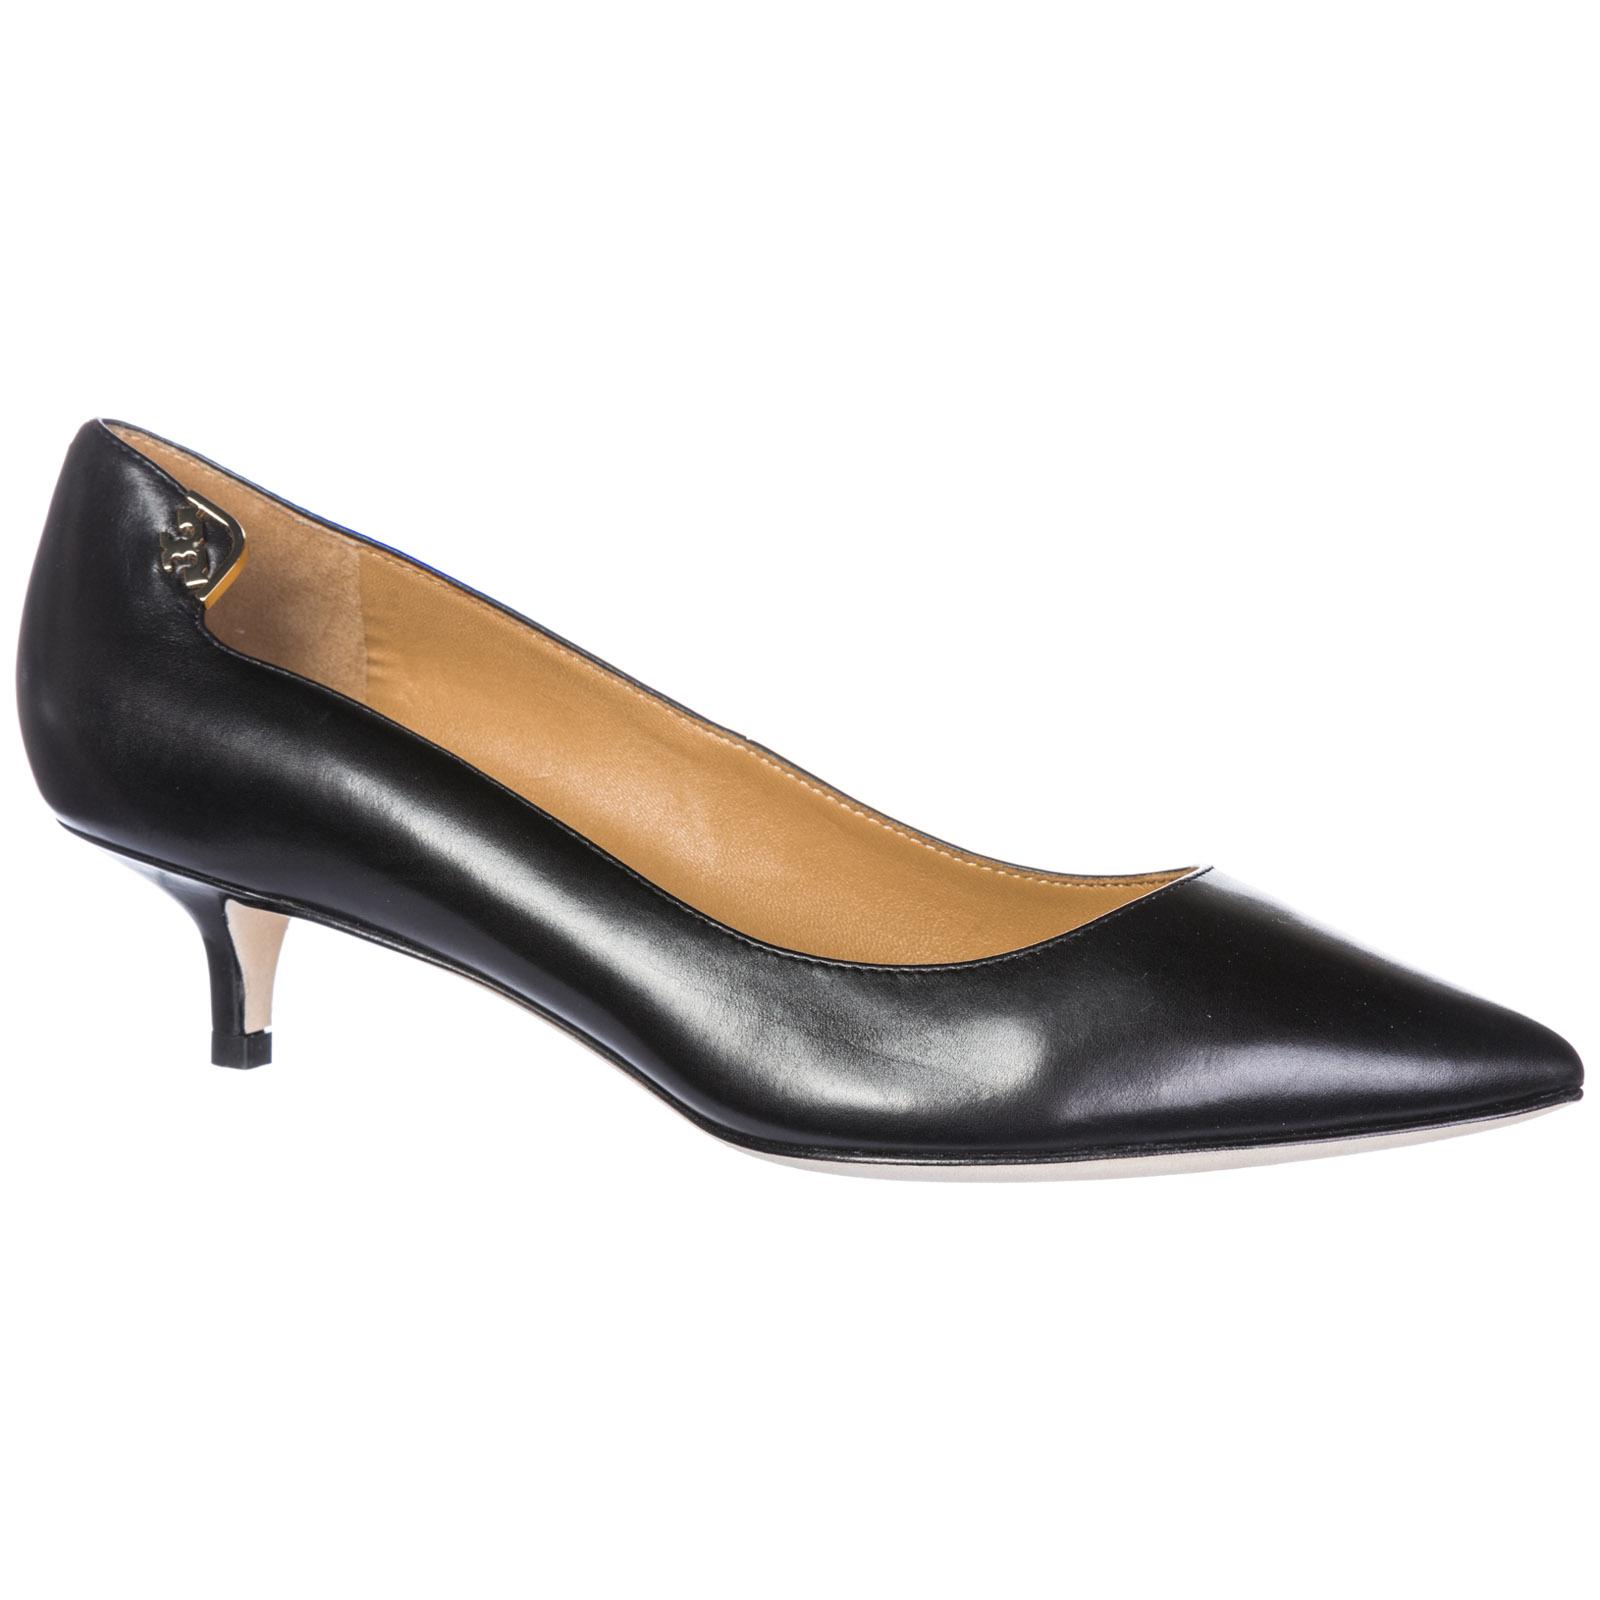 cef4bf0e0 Tory Burch Women's leather pumps court shoes high heel elizabeth